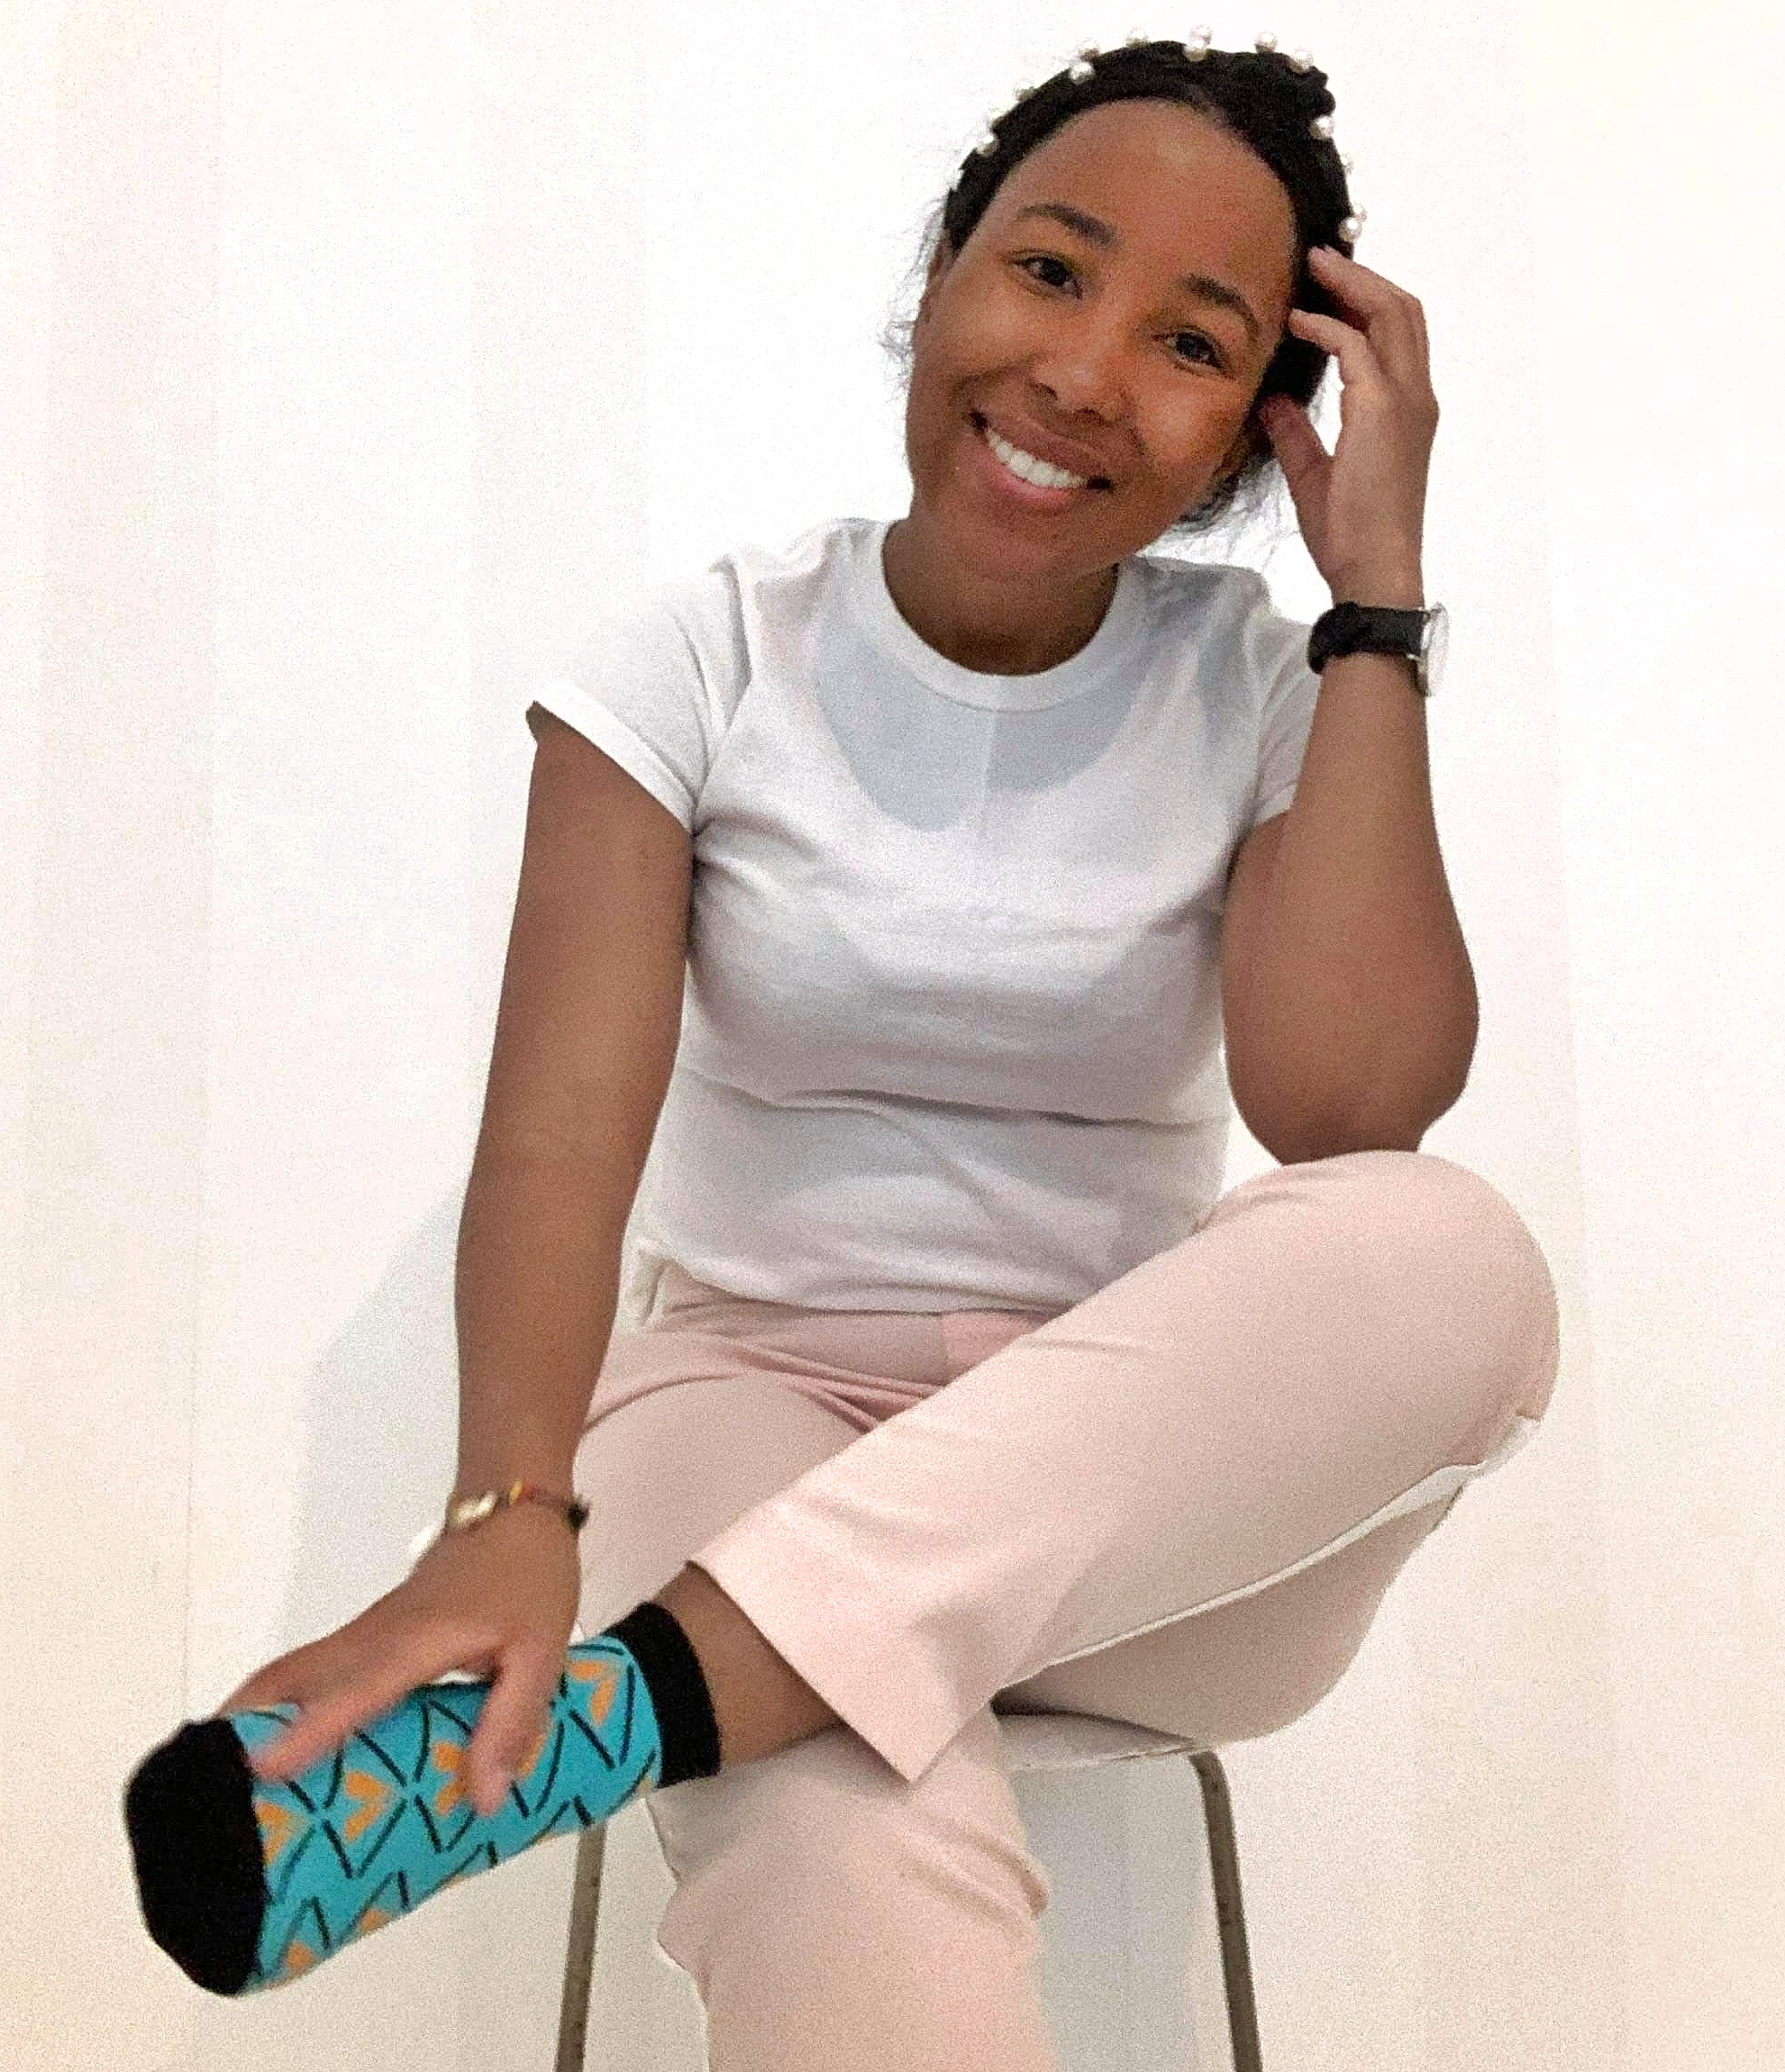 aicha black woman traveling minimalist